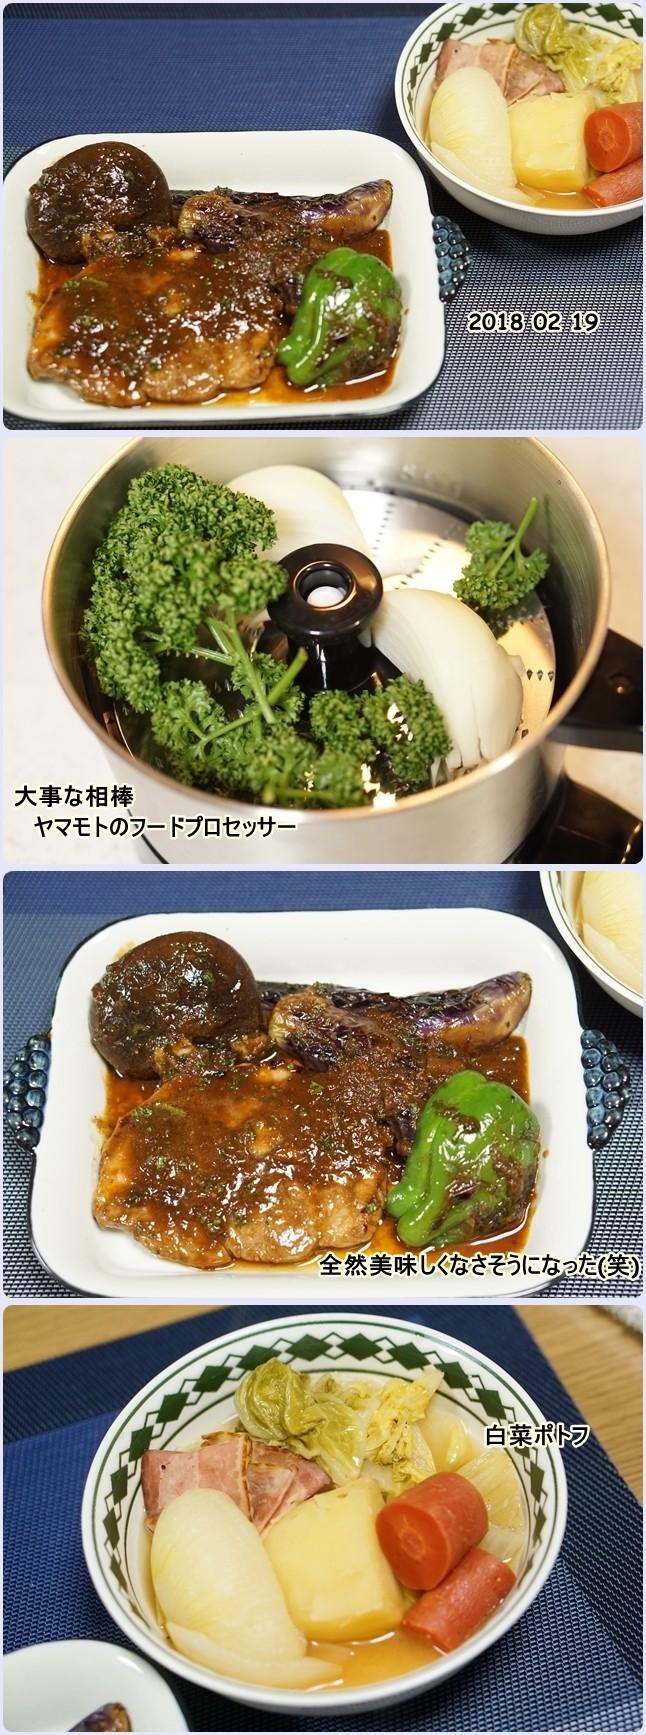 ■DSC04896-vert